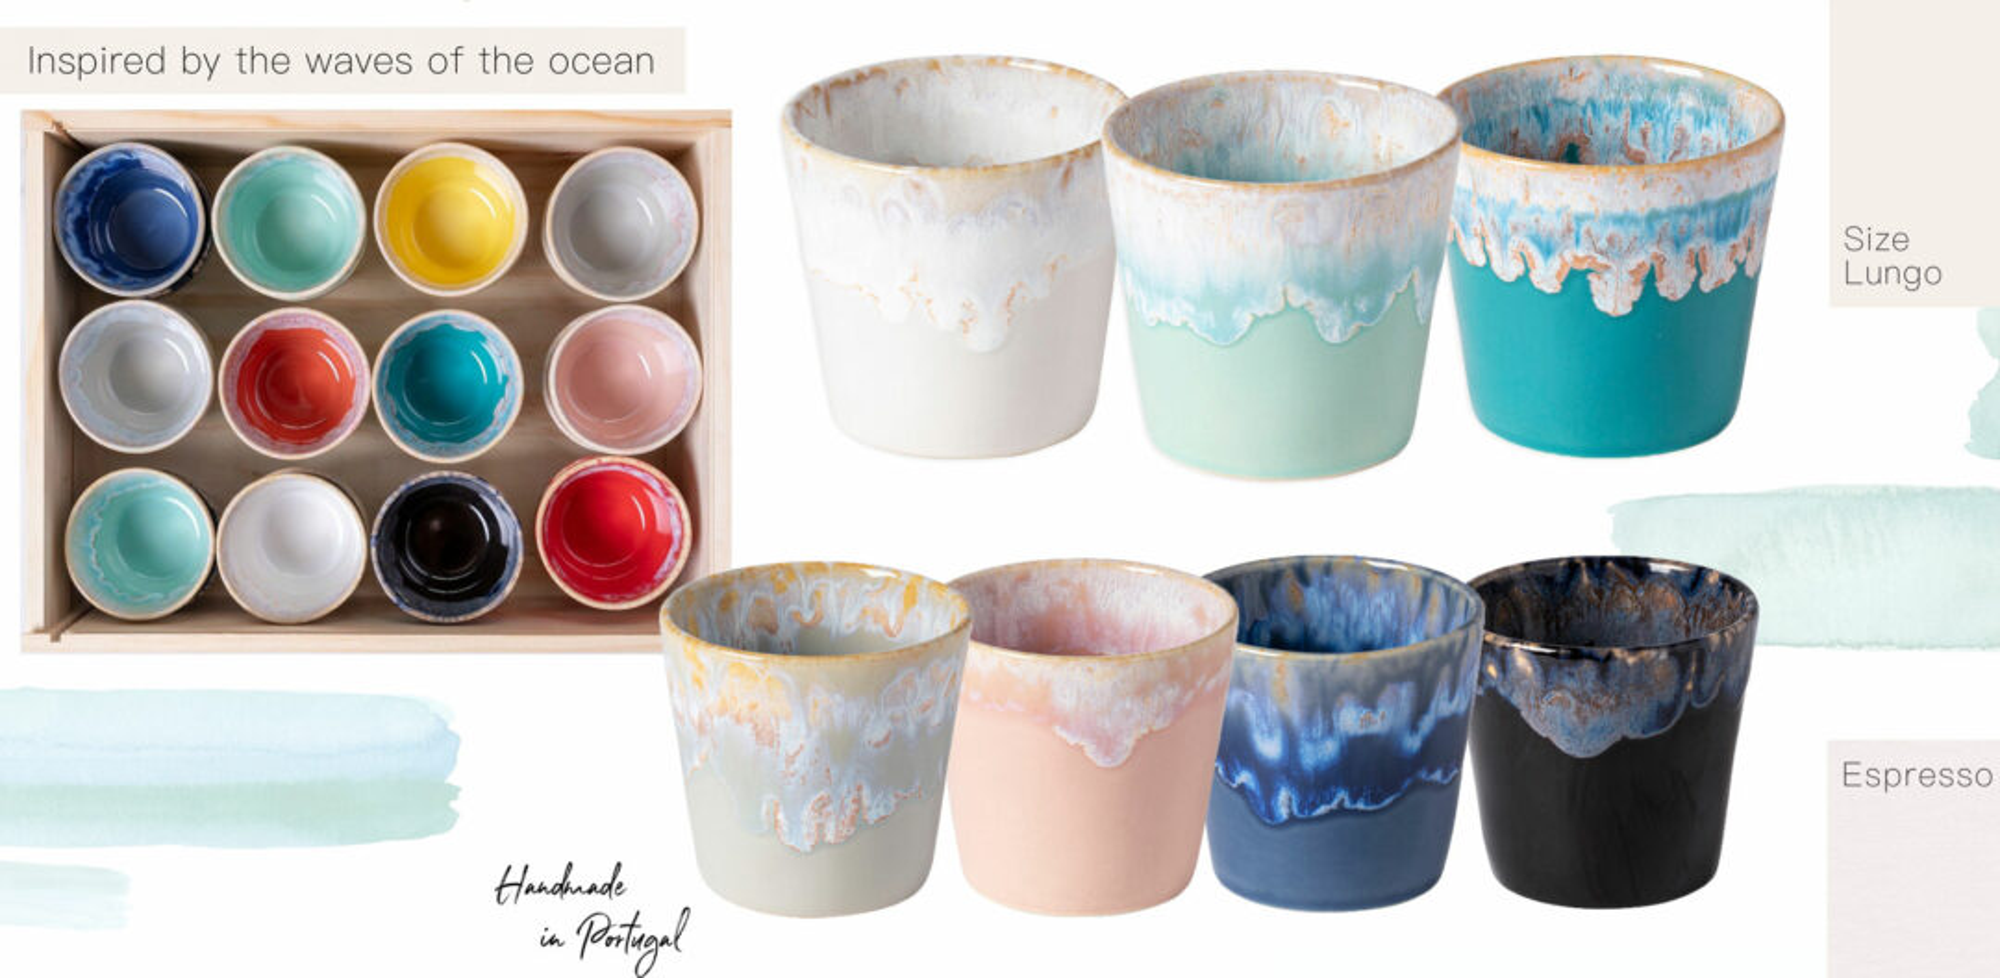 espresso-cups-bohoria-kitchen-interior